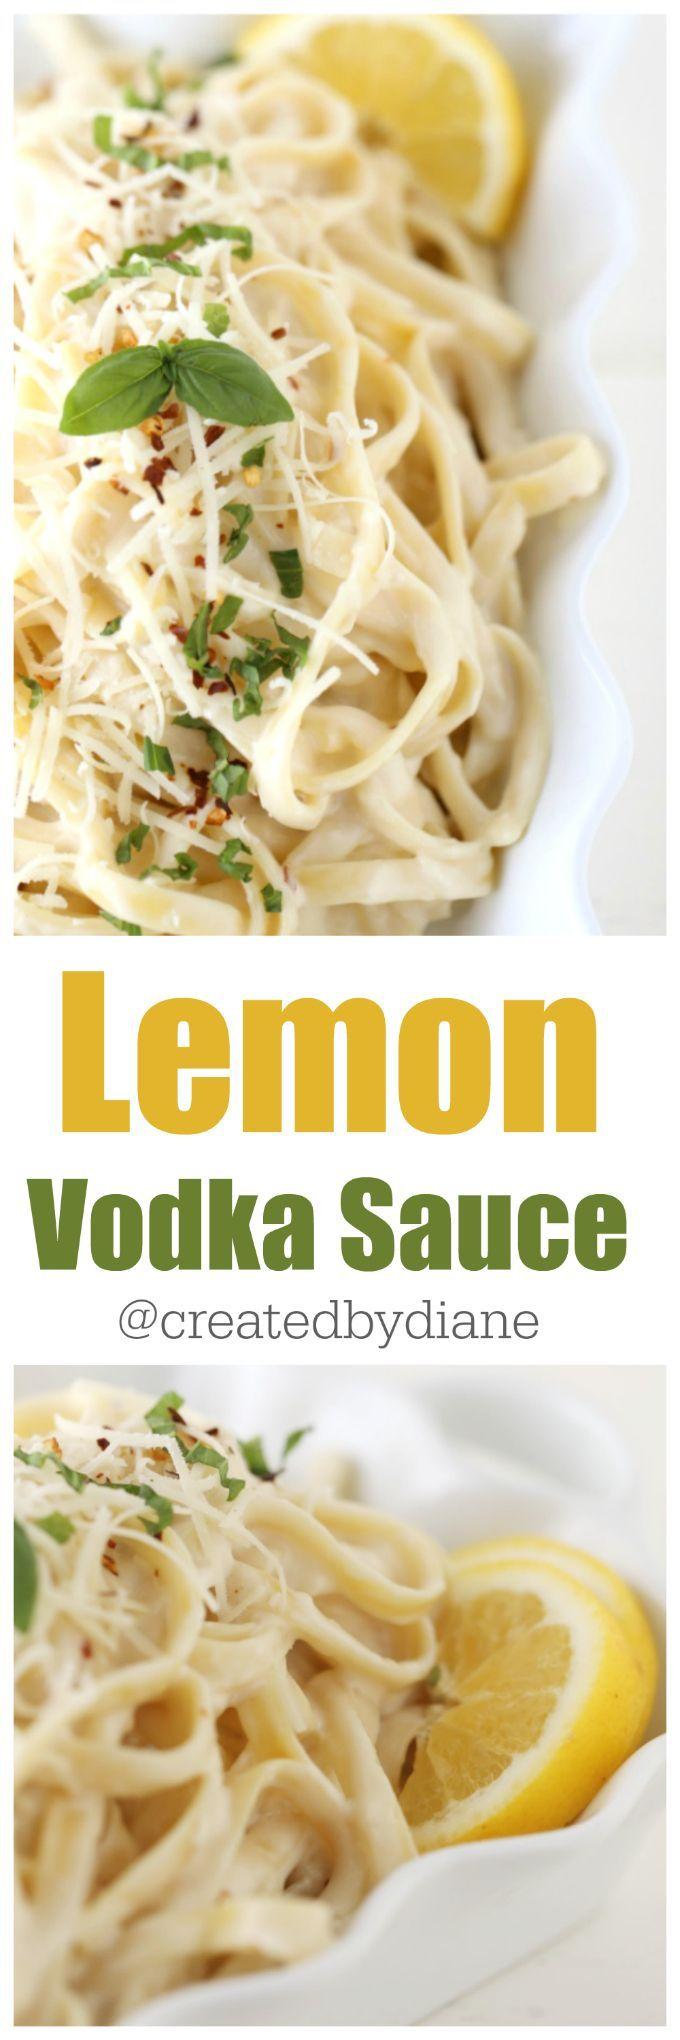 lemon-vodka-sauce-recipe-from-createdbydiane